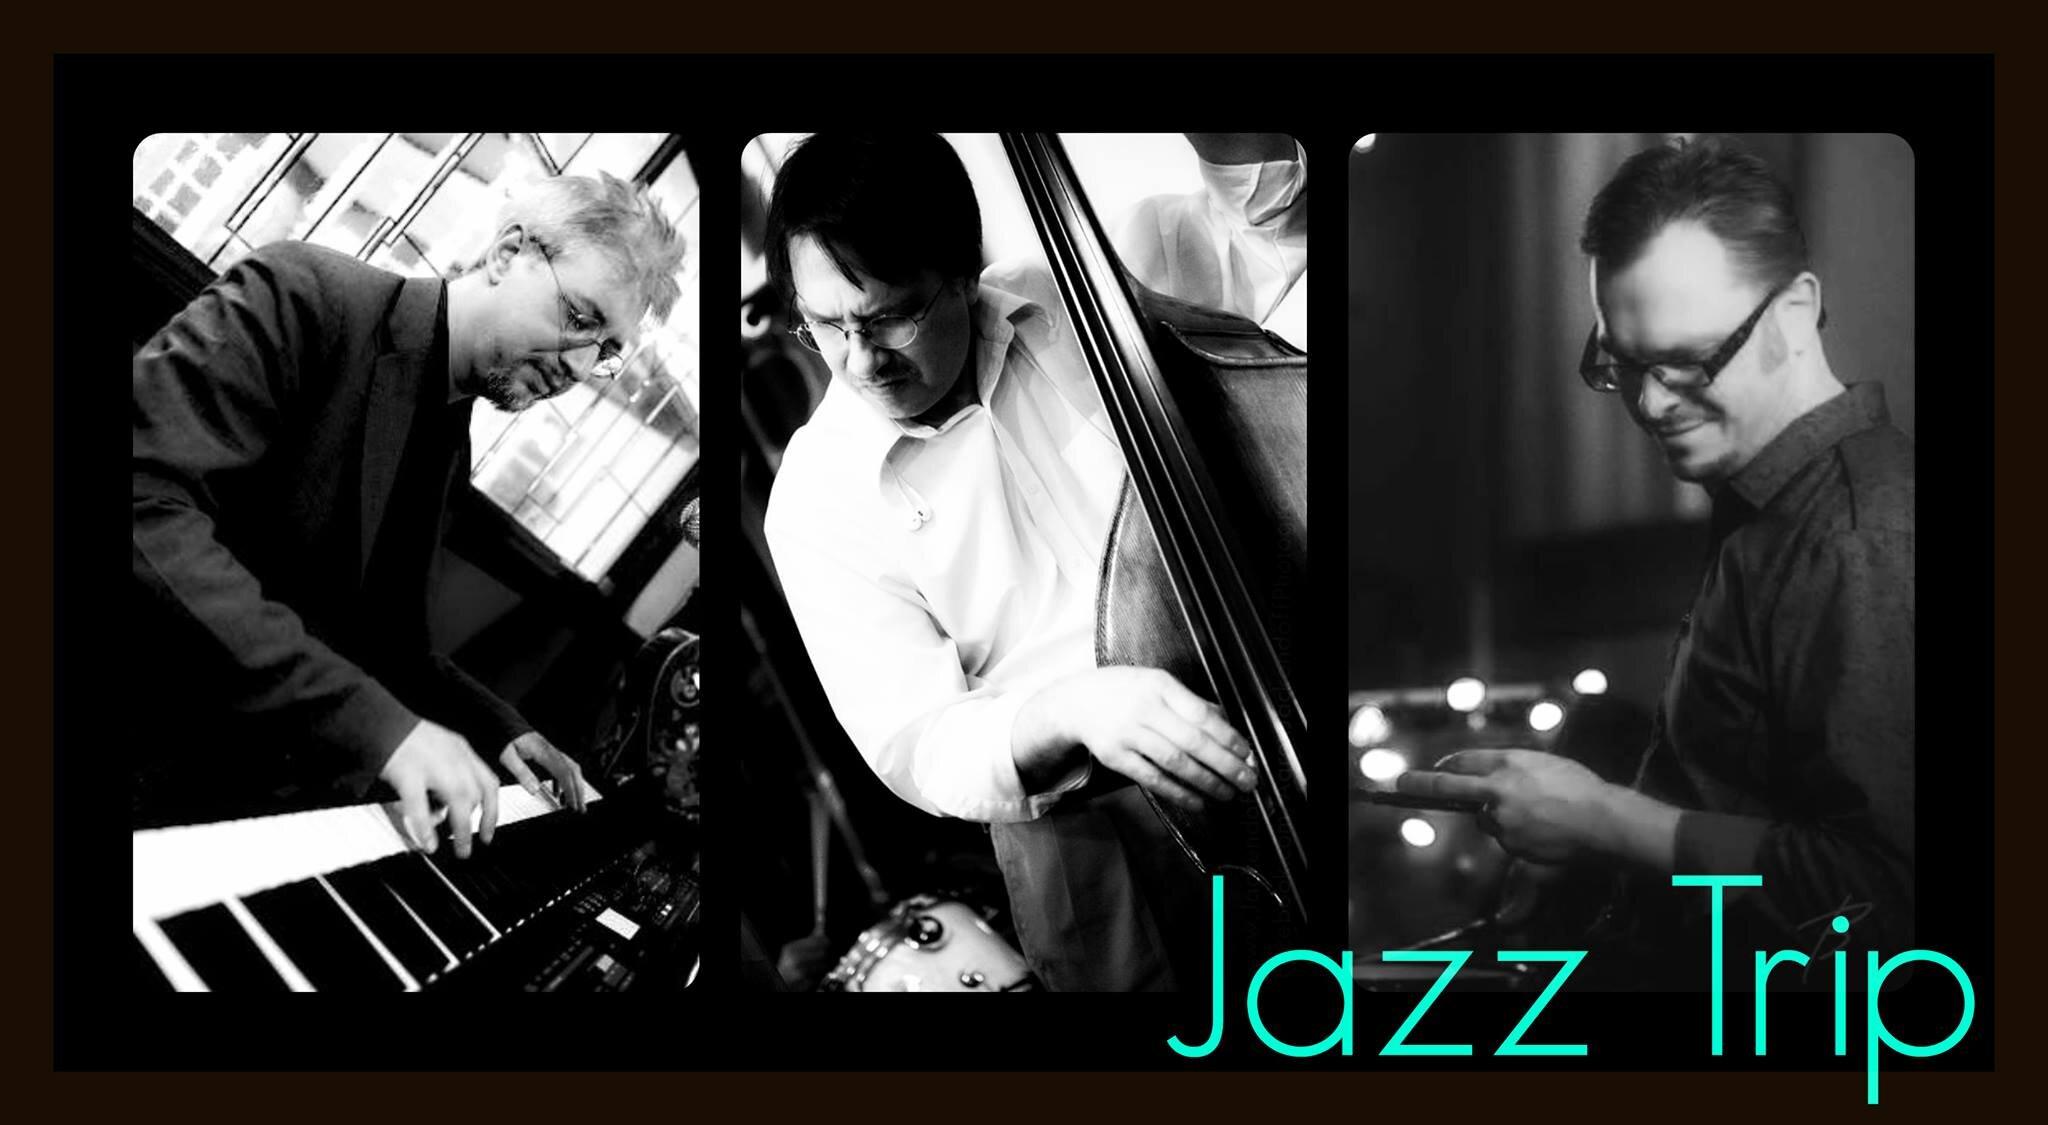 Jazz Trip - Joshua Ben, Mark Perna, Zach Bodolosky